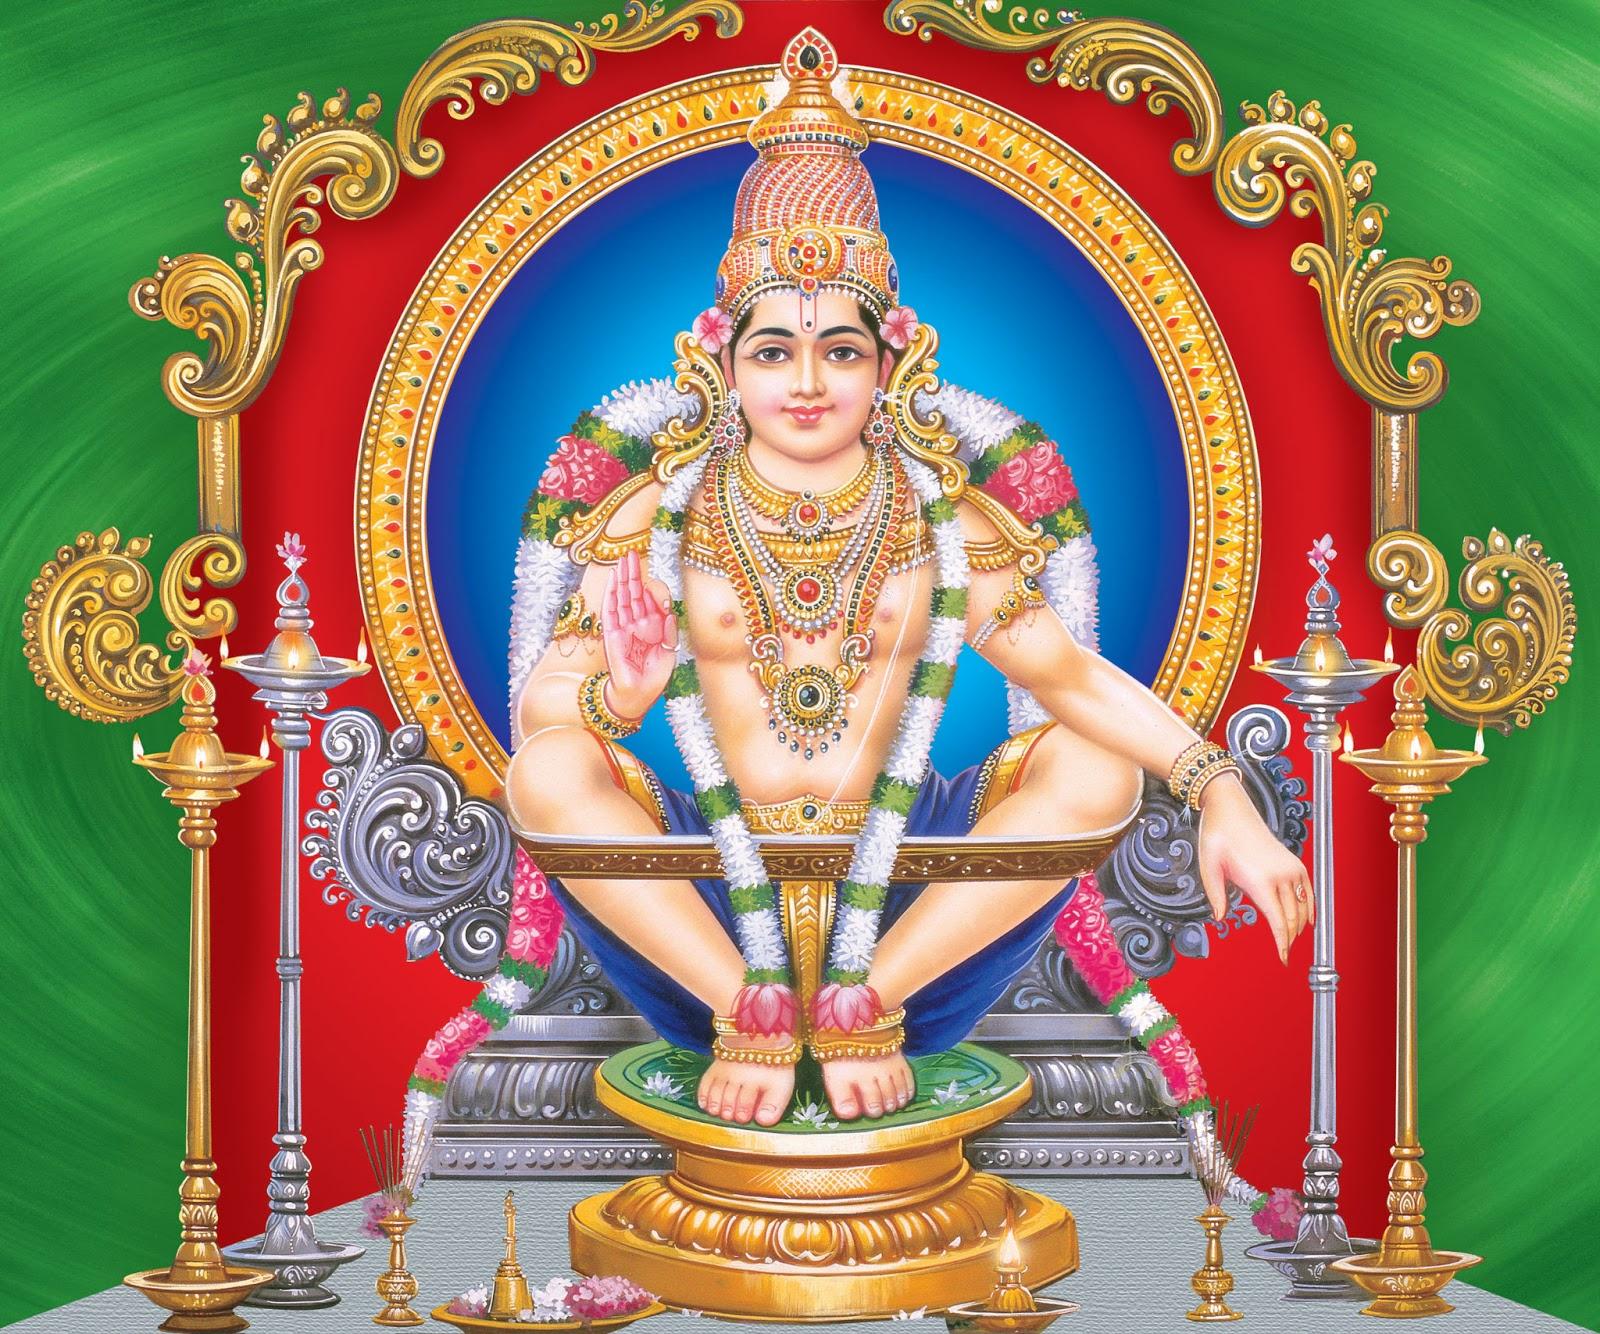 hindu gods Discover articles and resources related to the hindu universe of gods and goddesses: ganesha, shiva, krishna, durga, kali, lakshmi, saraswati, jagannath, hanuman.